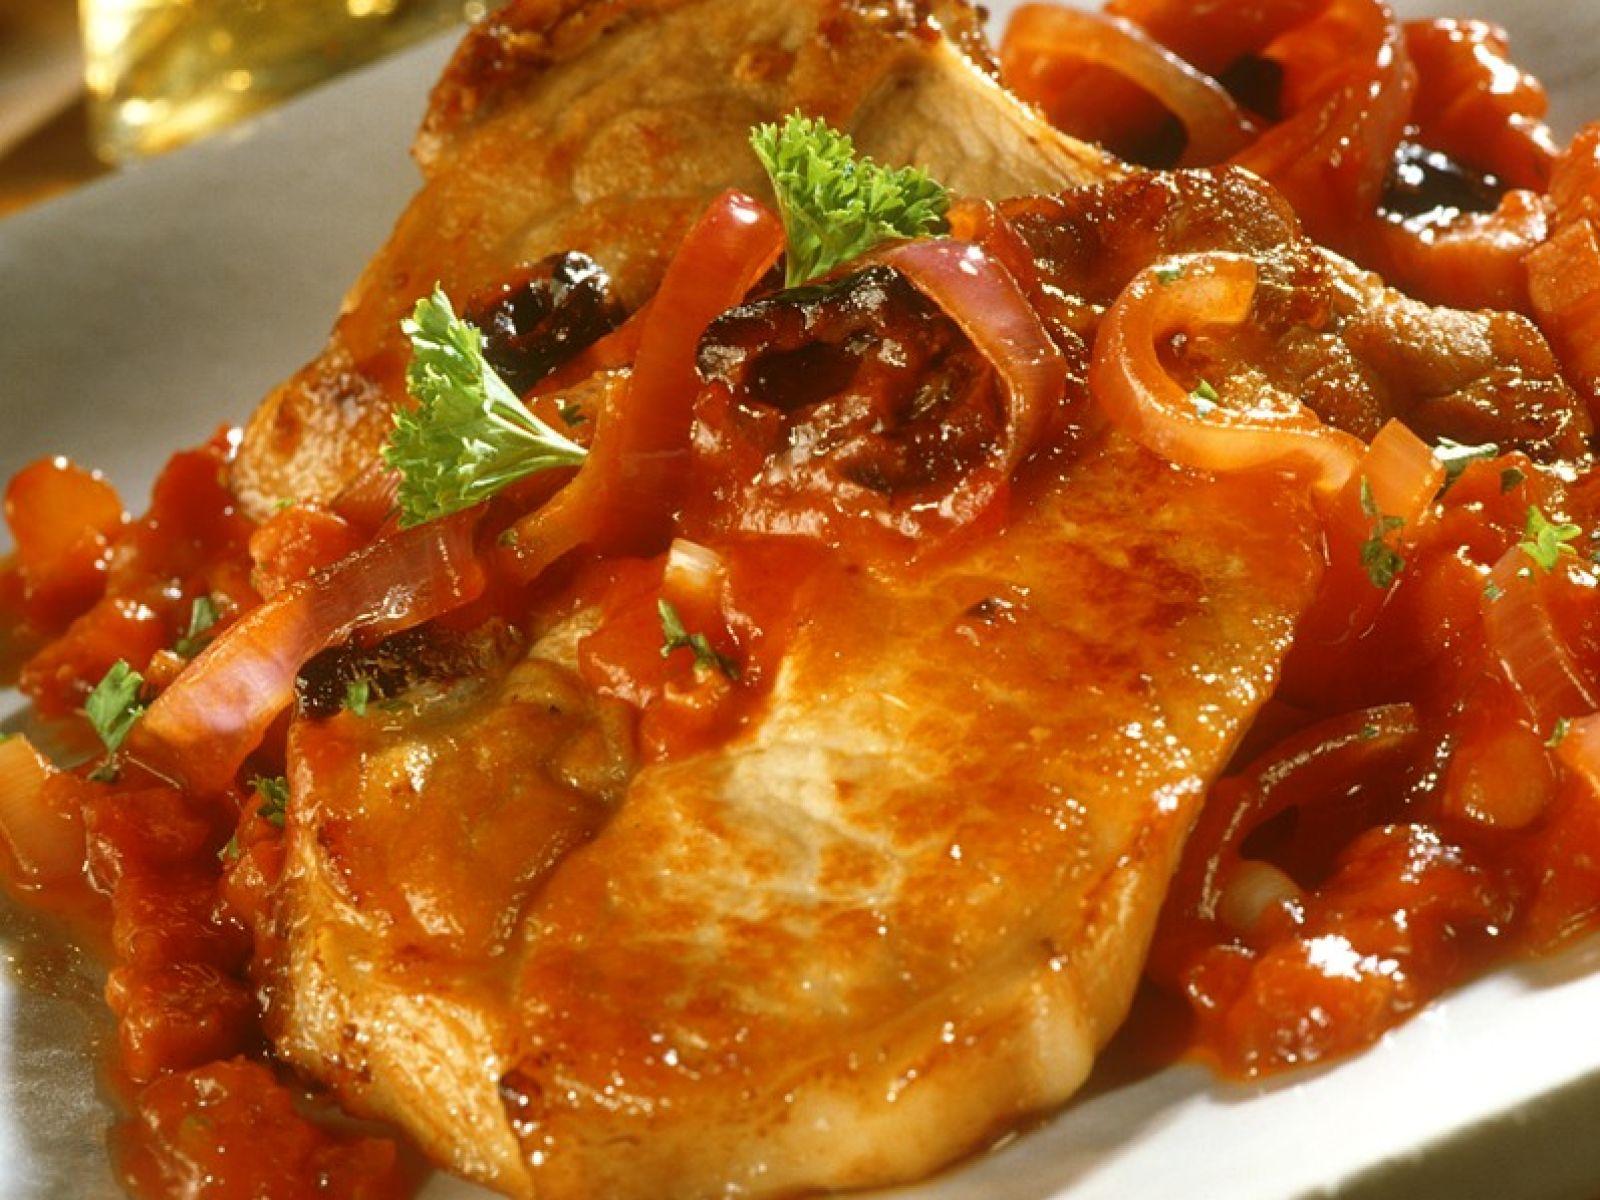 stuffed pork chops with tomato sauce Pork Chops in Tomato Sauce